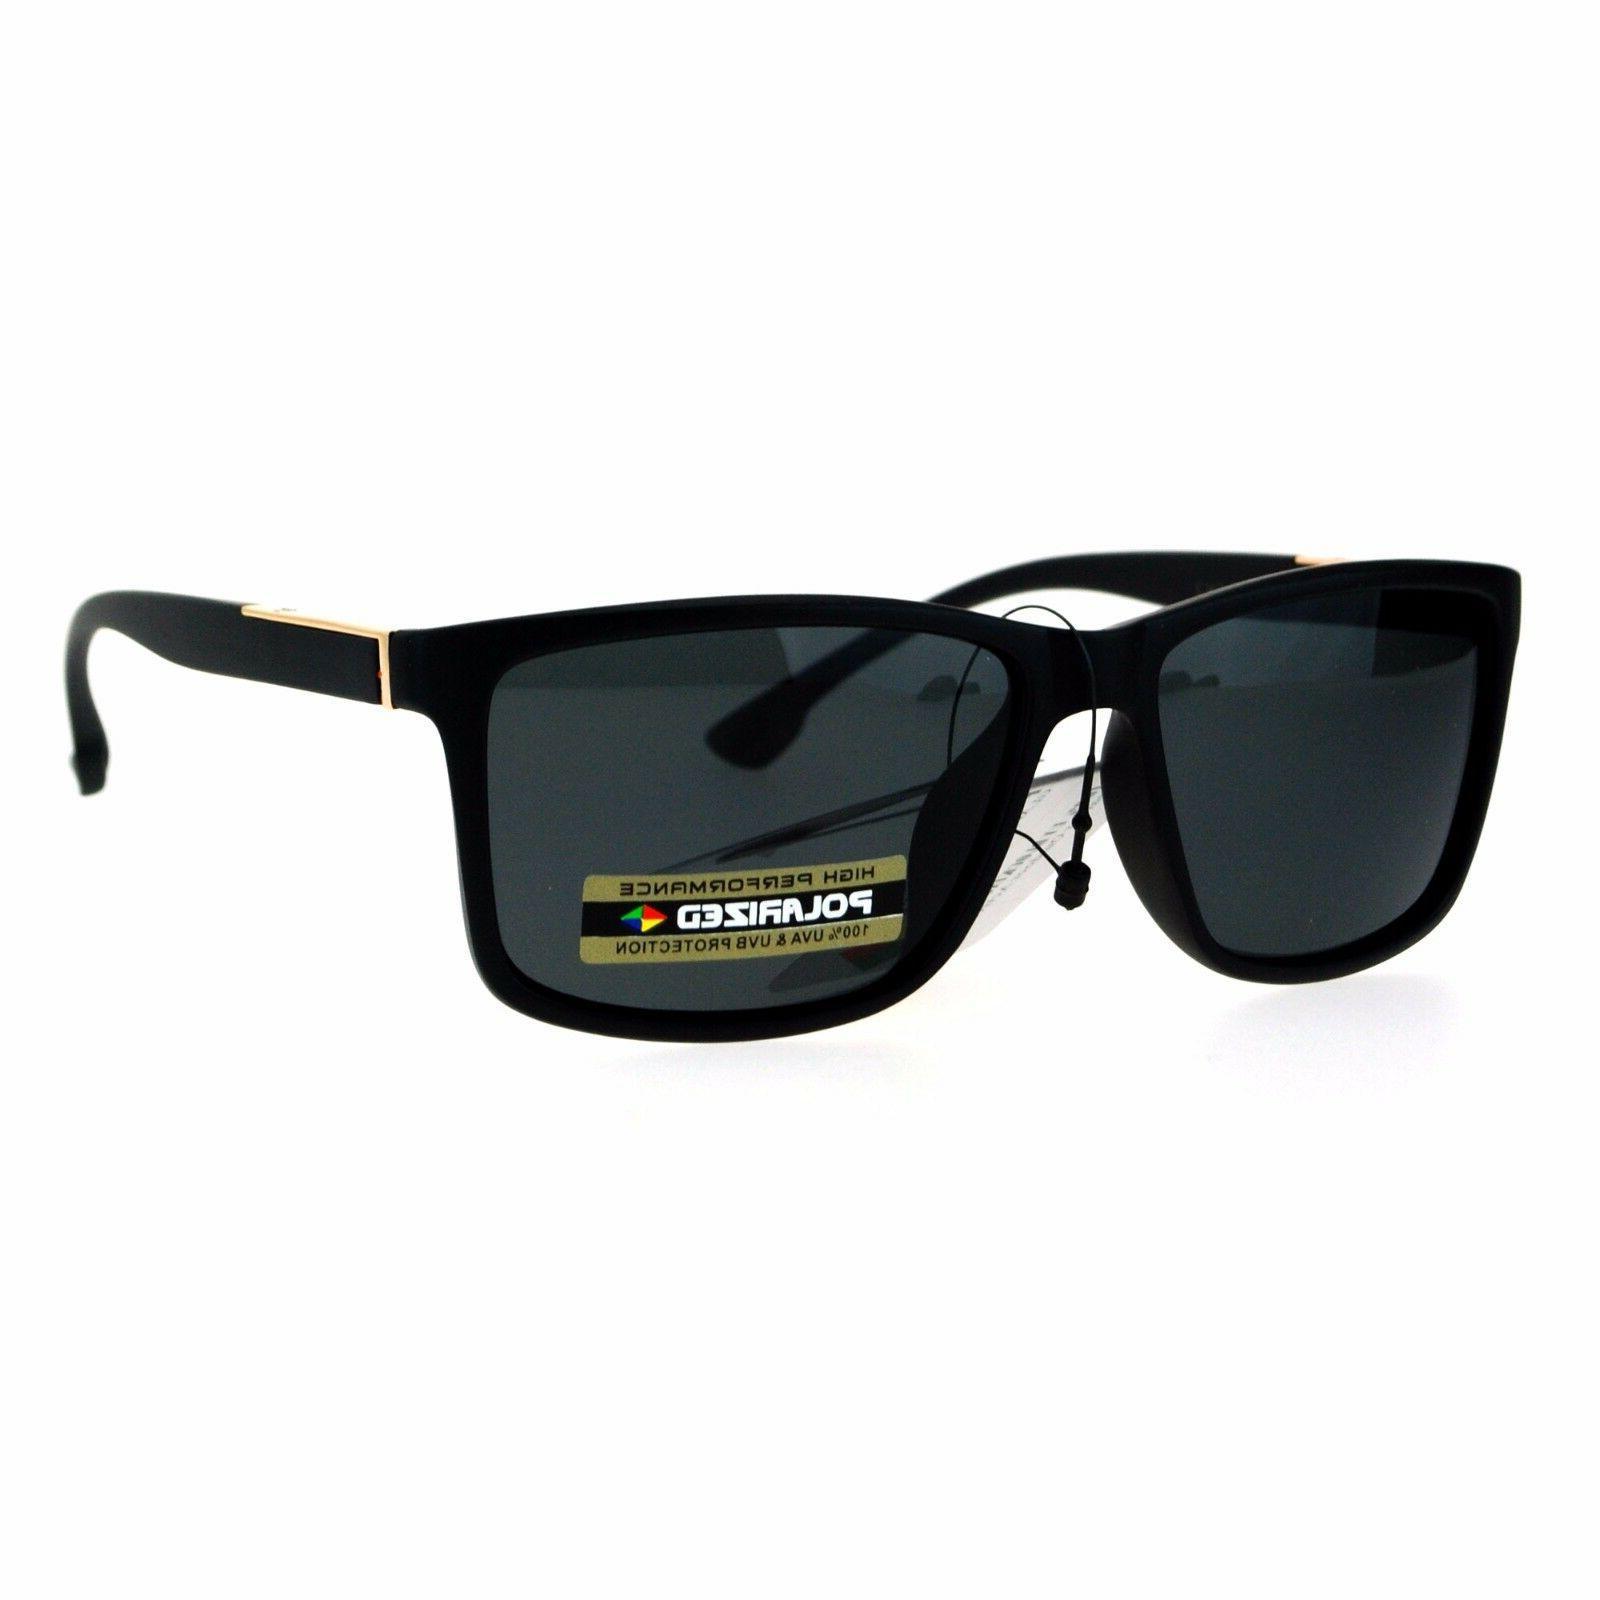 polarized lens mens sunglasses classic fashion rectangular